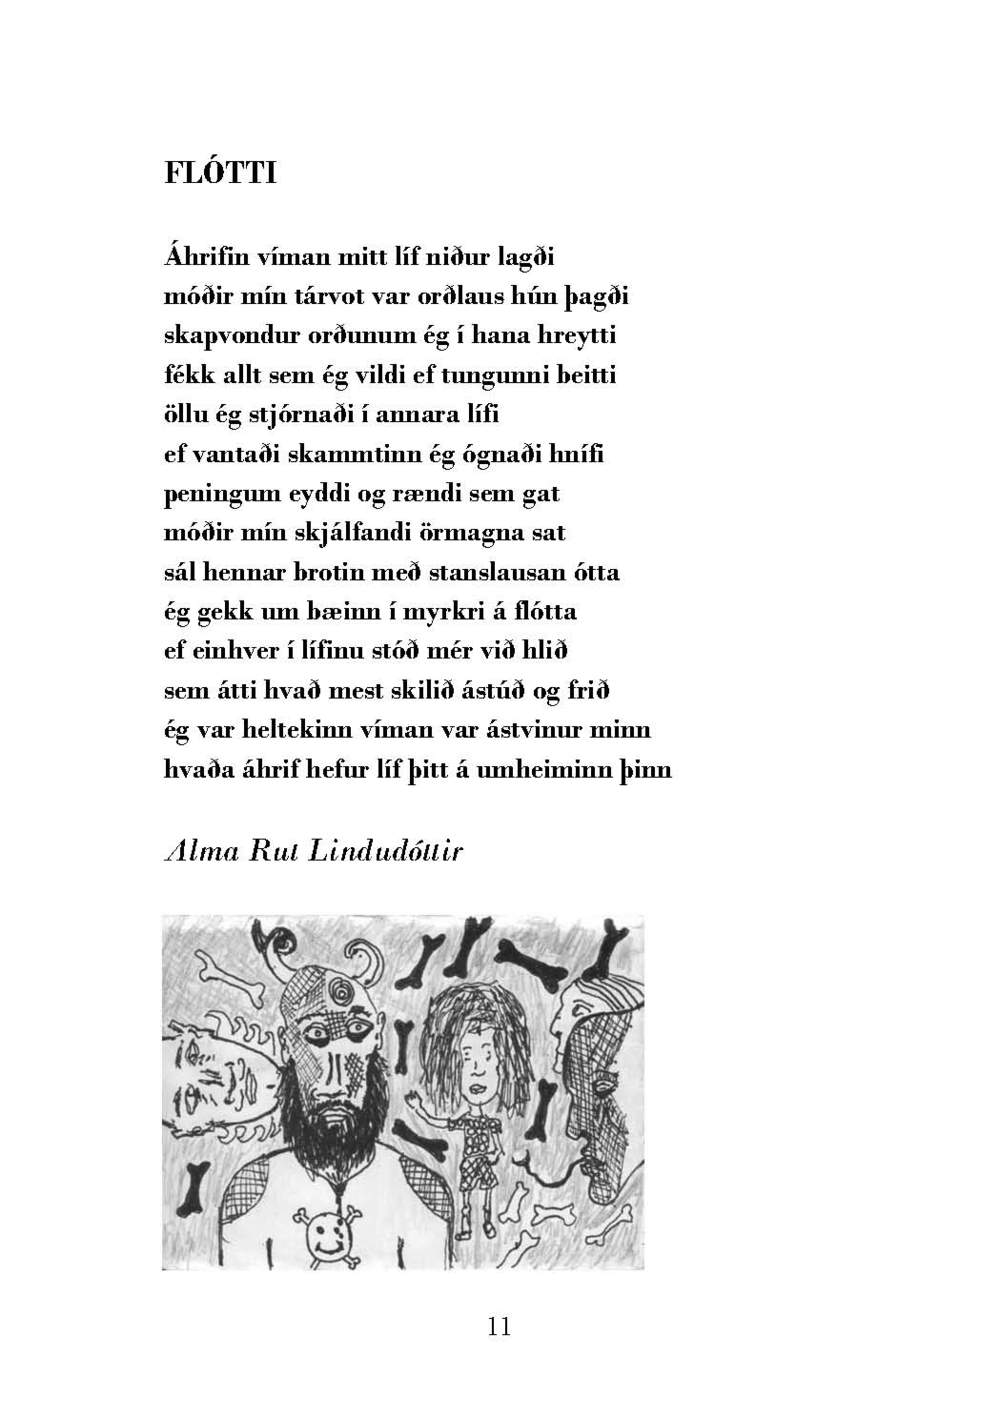 27073-ljodabokin--oll_Page_29.jpg